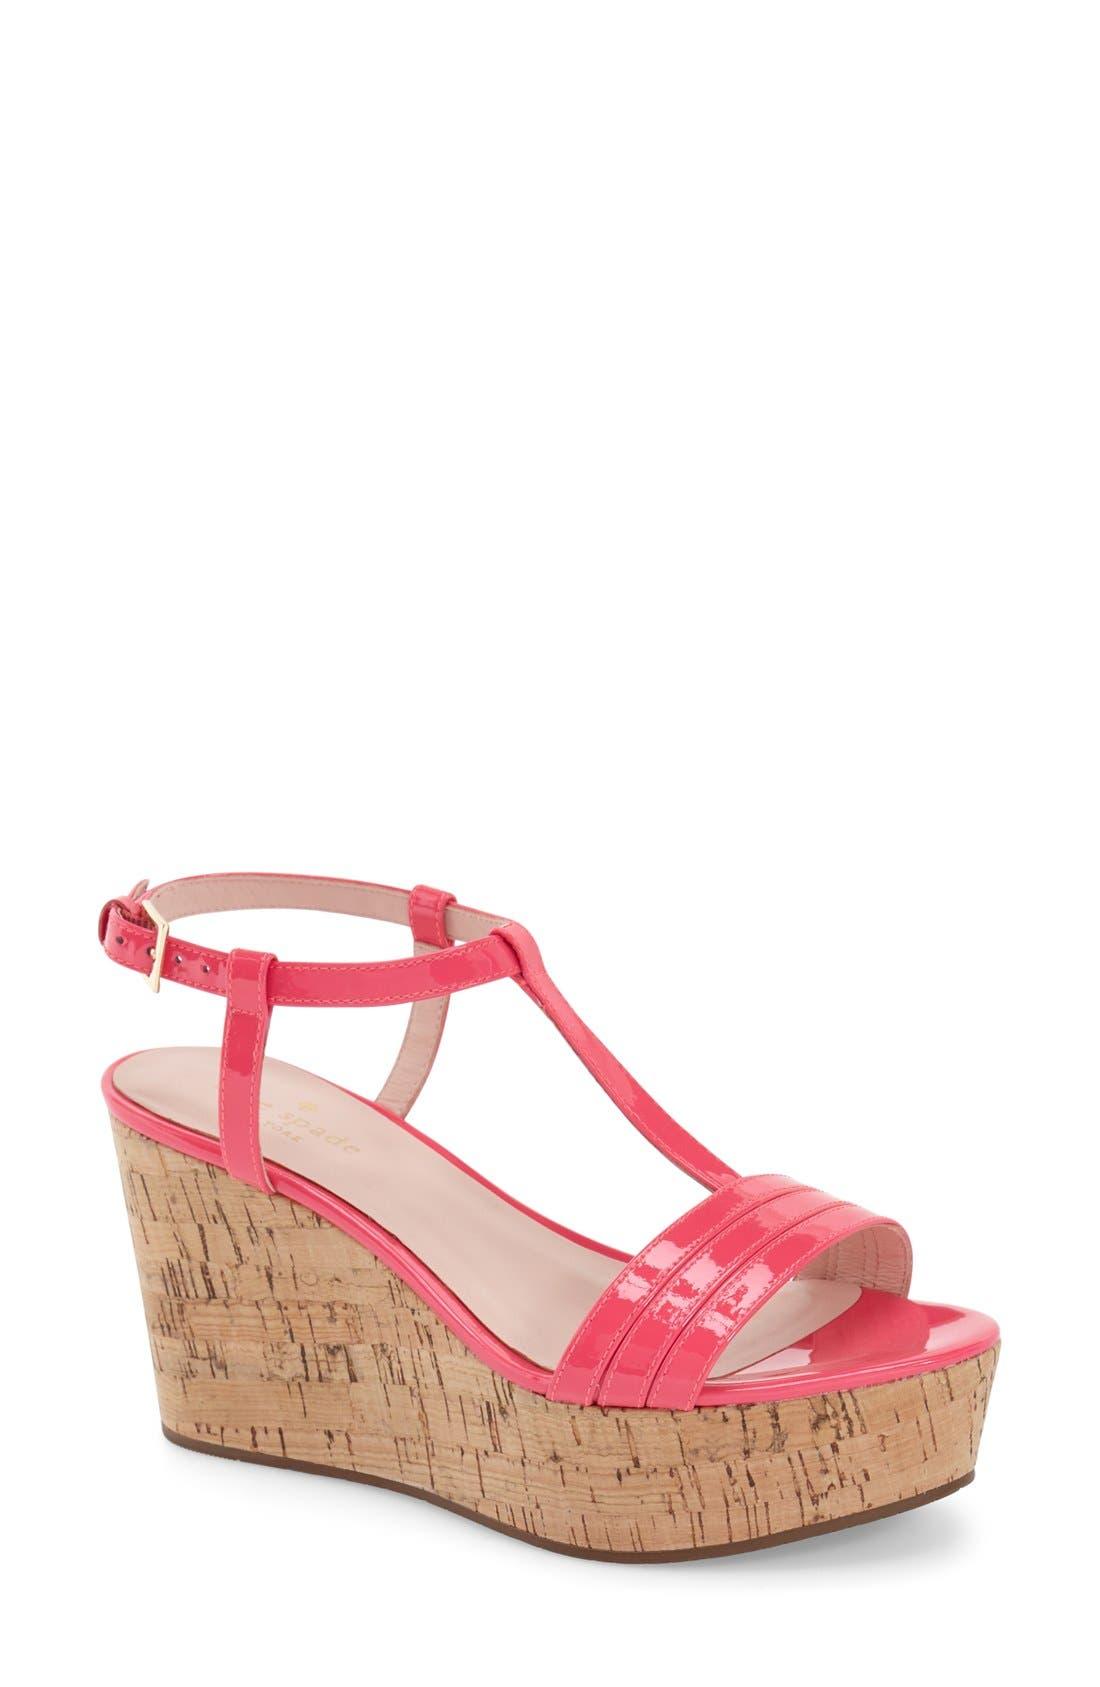 Main Image - kate spade new york 'tallin' wedge sandal (Women)